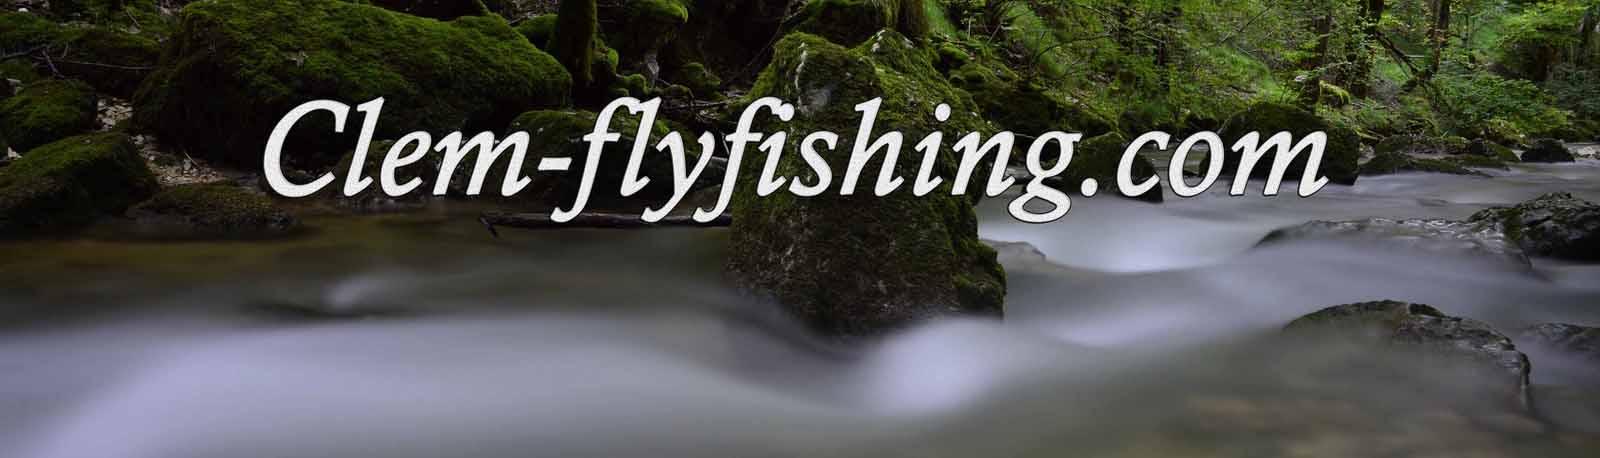 clem-flyfishing.com